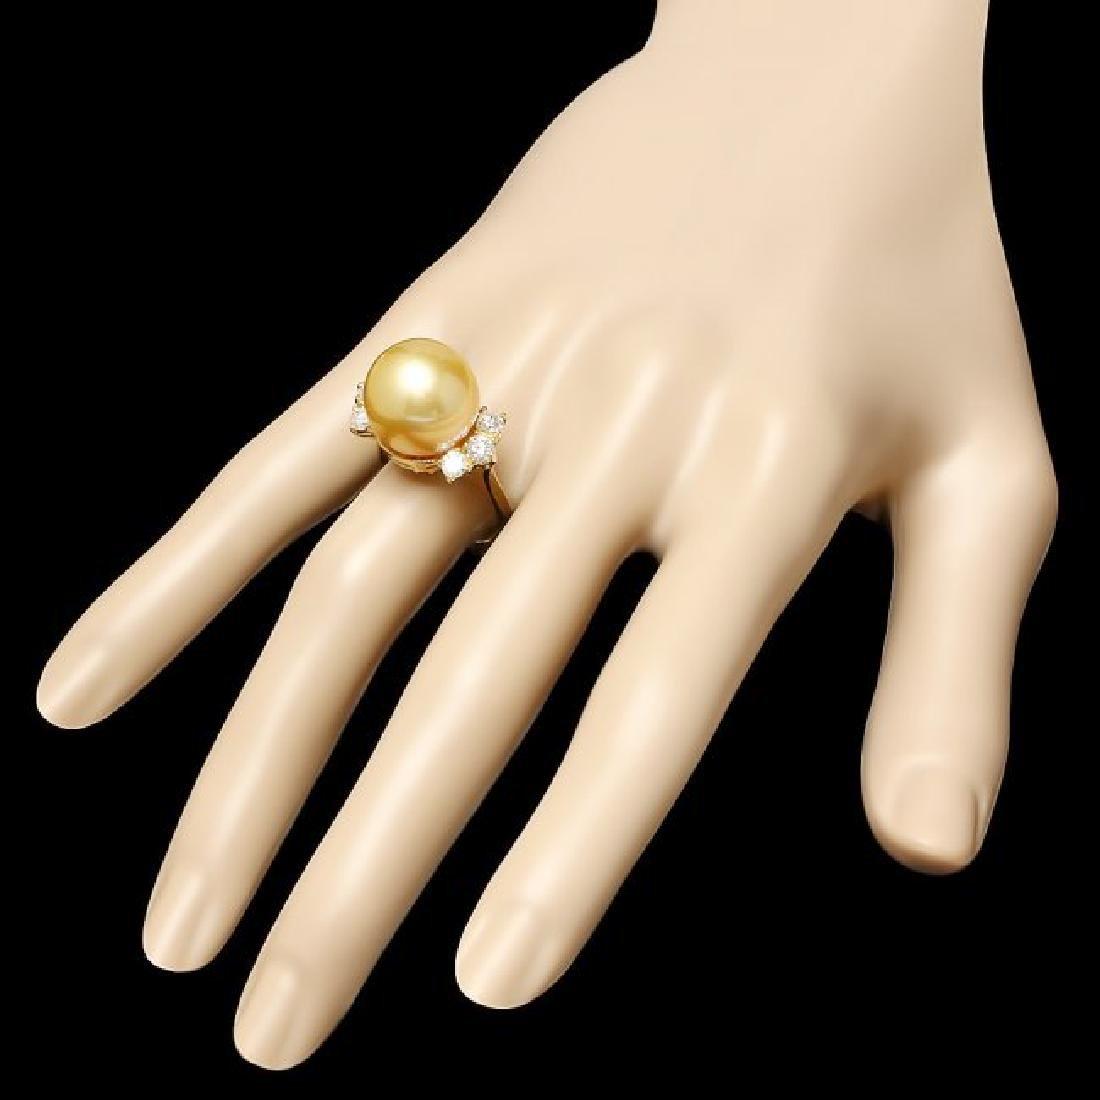 14k Gold 14 X 14mm Pearl 0.80ct Diamond Ring - 3